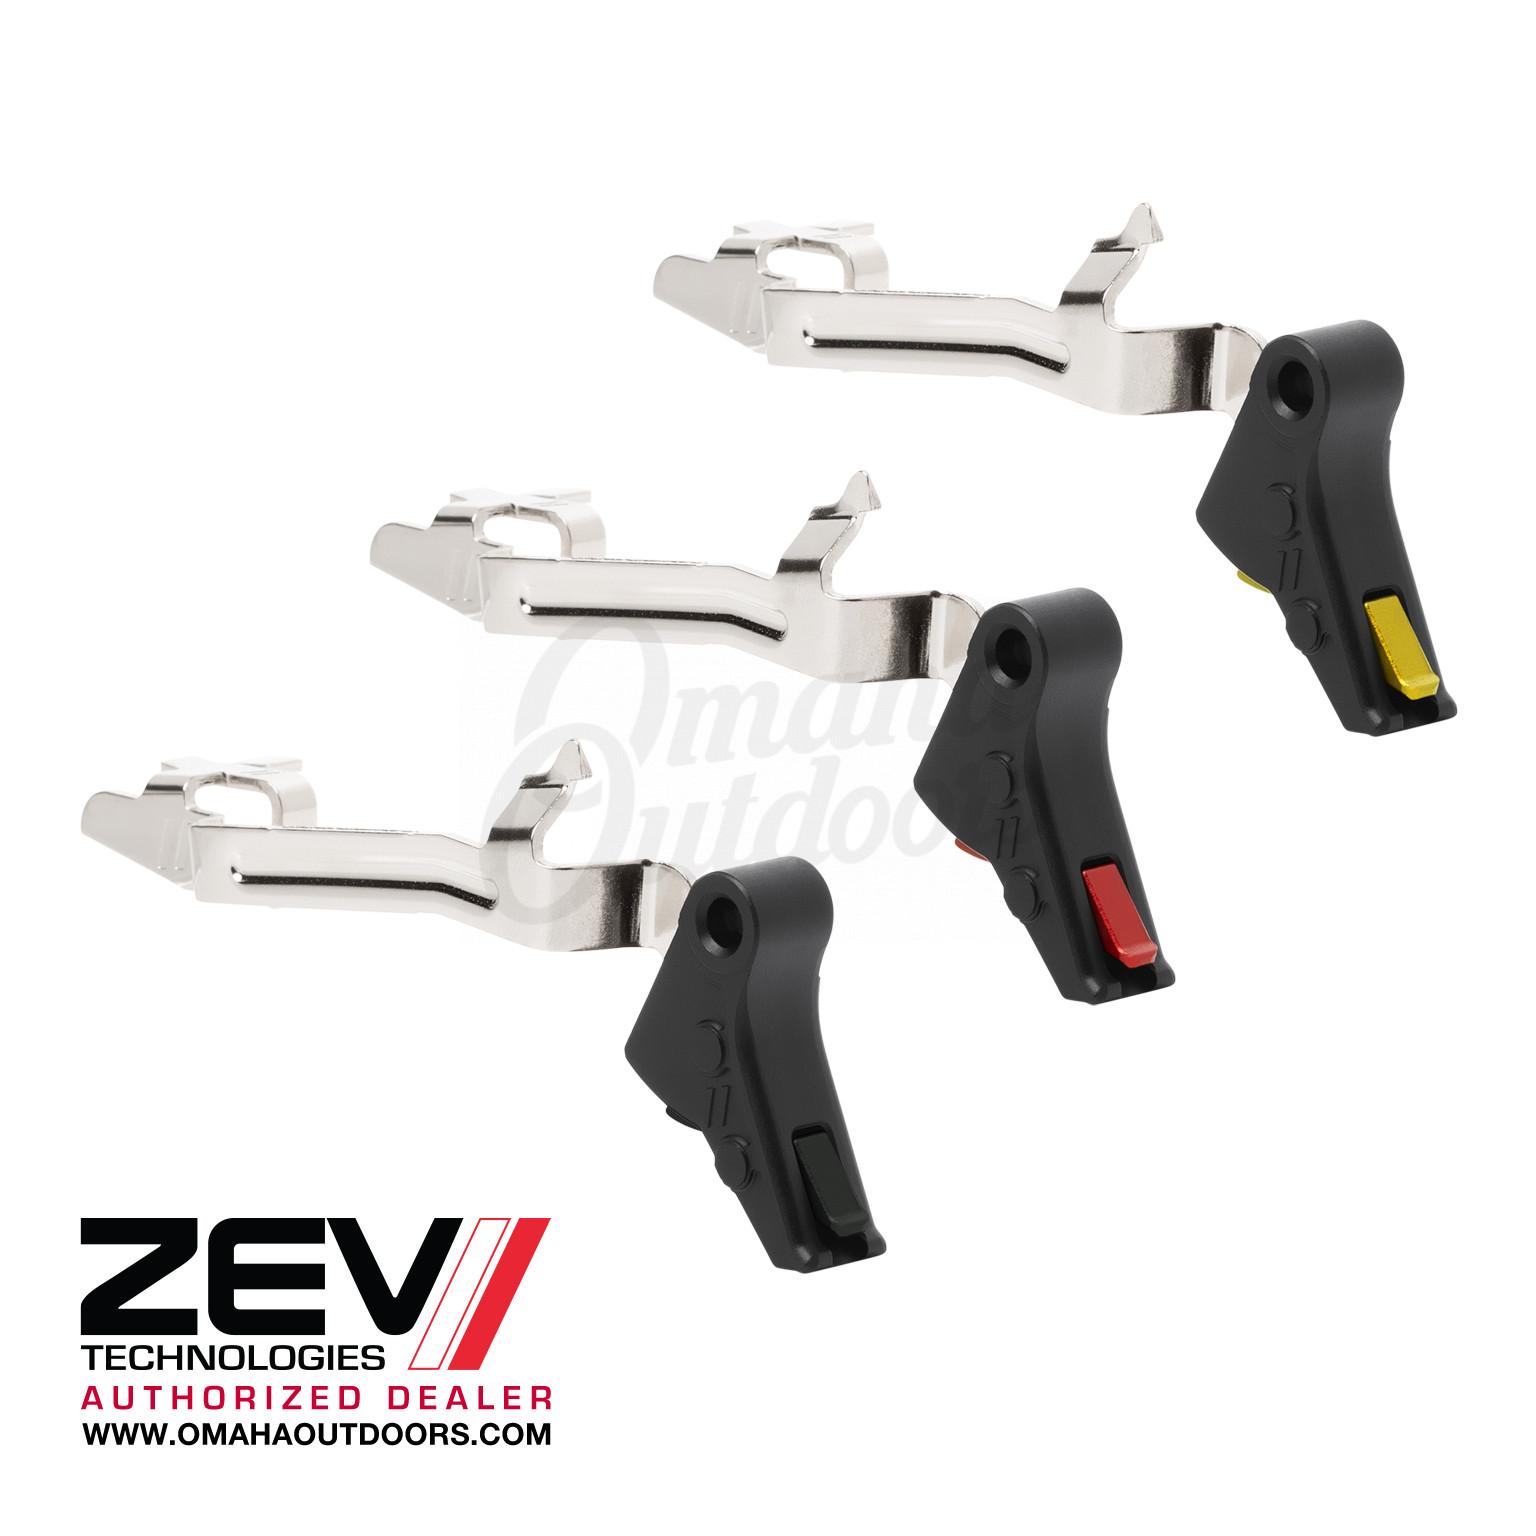 ZEV Tech PRO Flat Face Trigger Bar Kit Glock 17 19 22 23 26 27 31 32 34 35  37 38 Gen 3/4